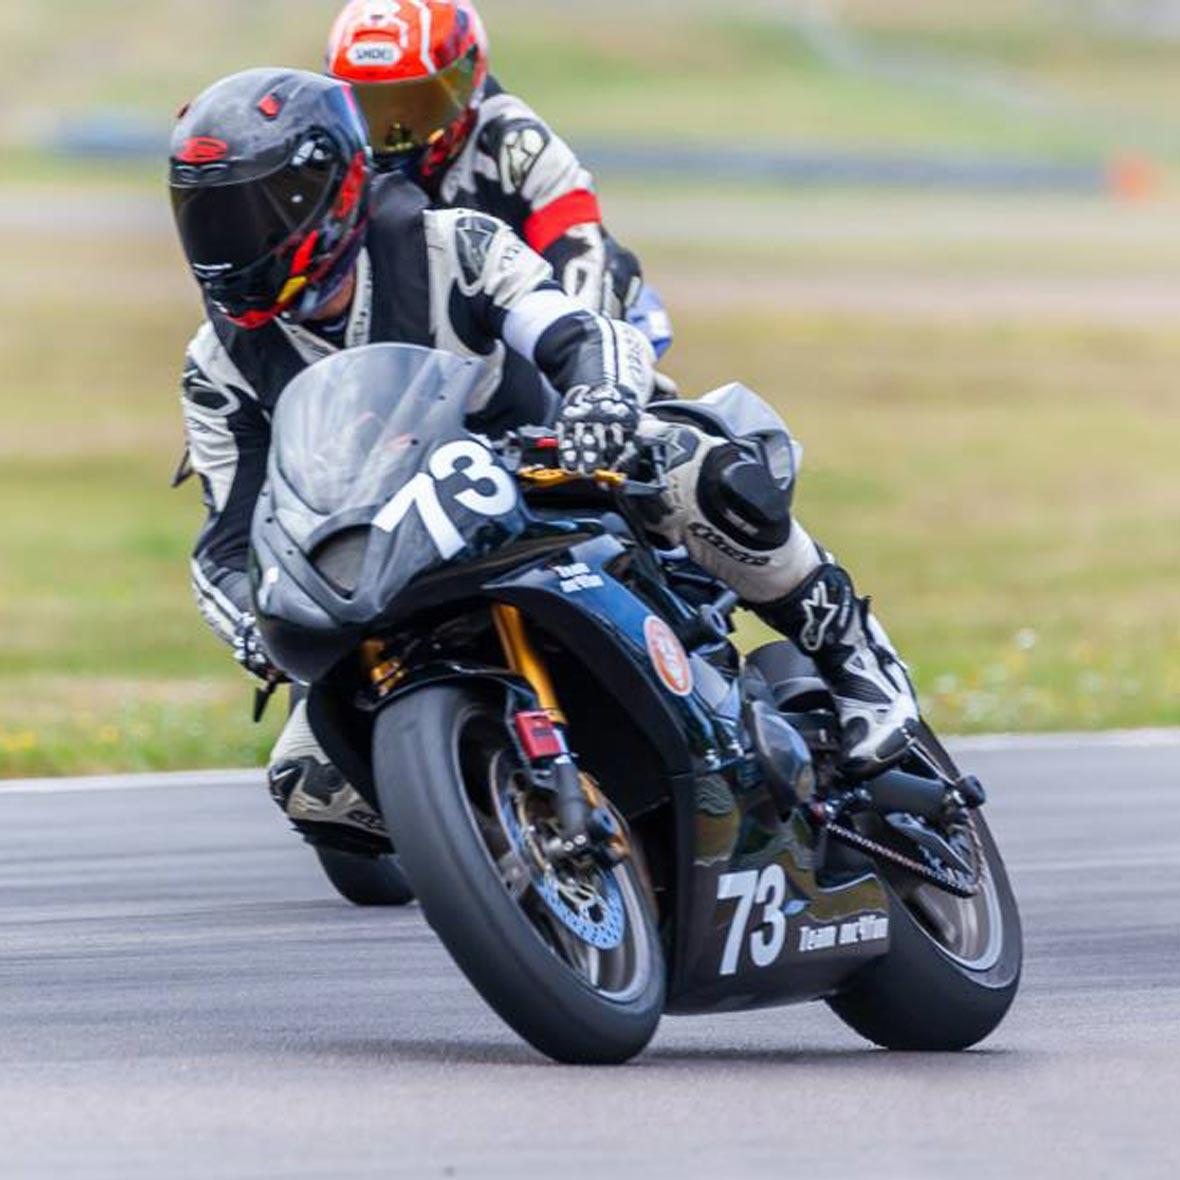 Triumph Daytona - Team mc4fun - Niclas Jansson